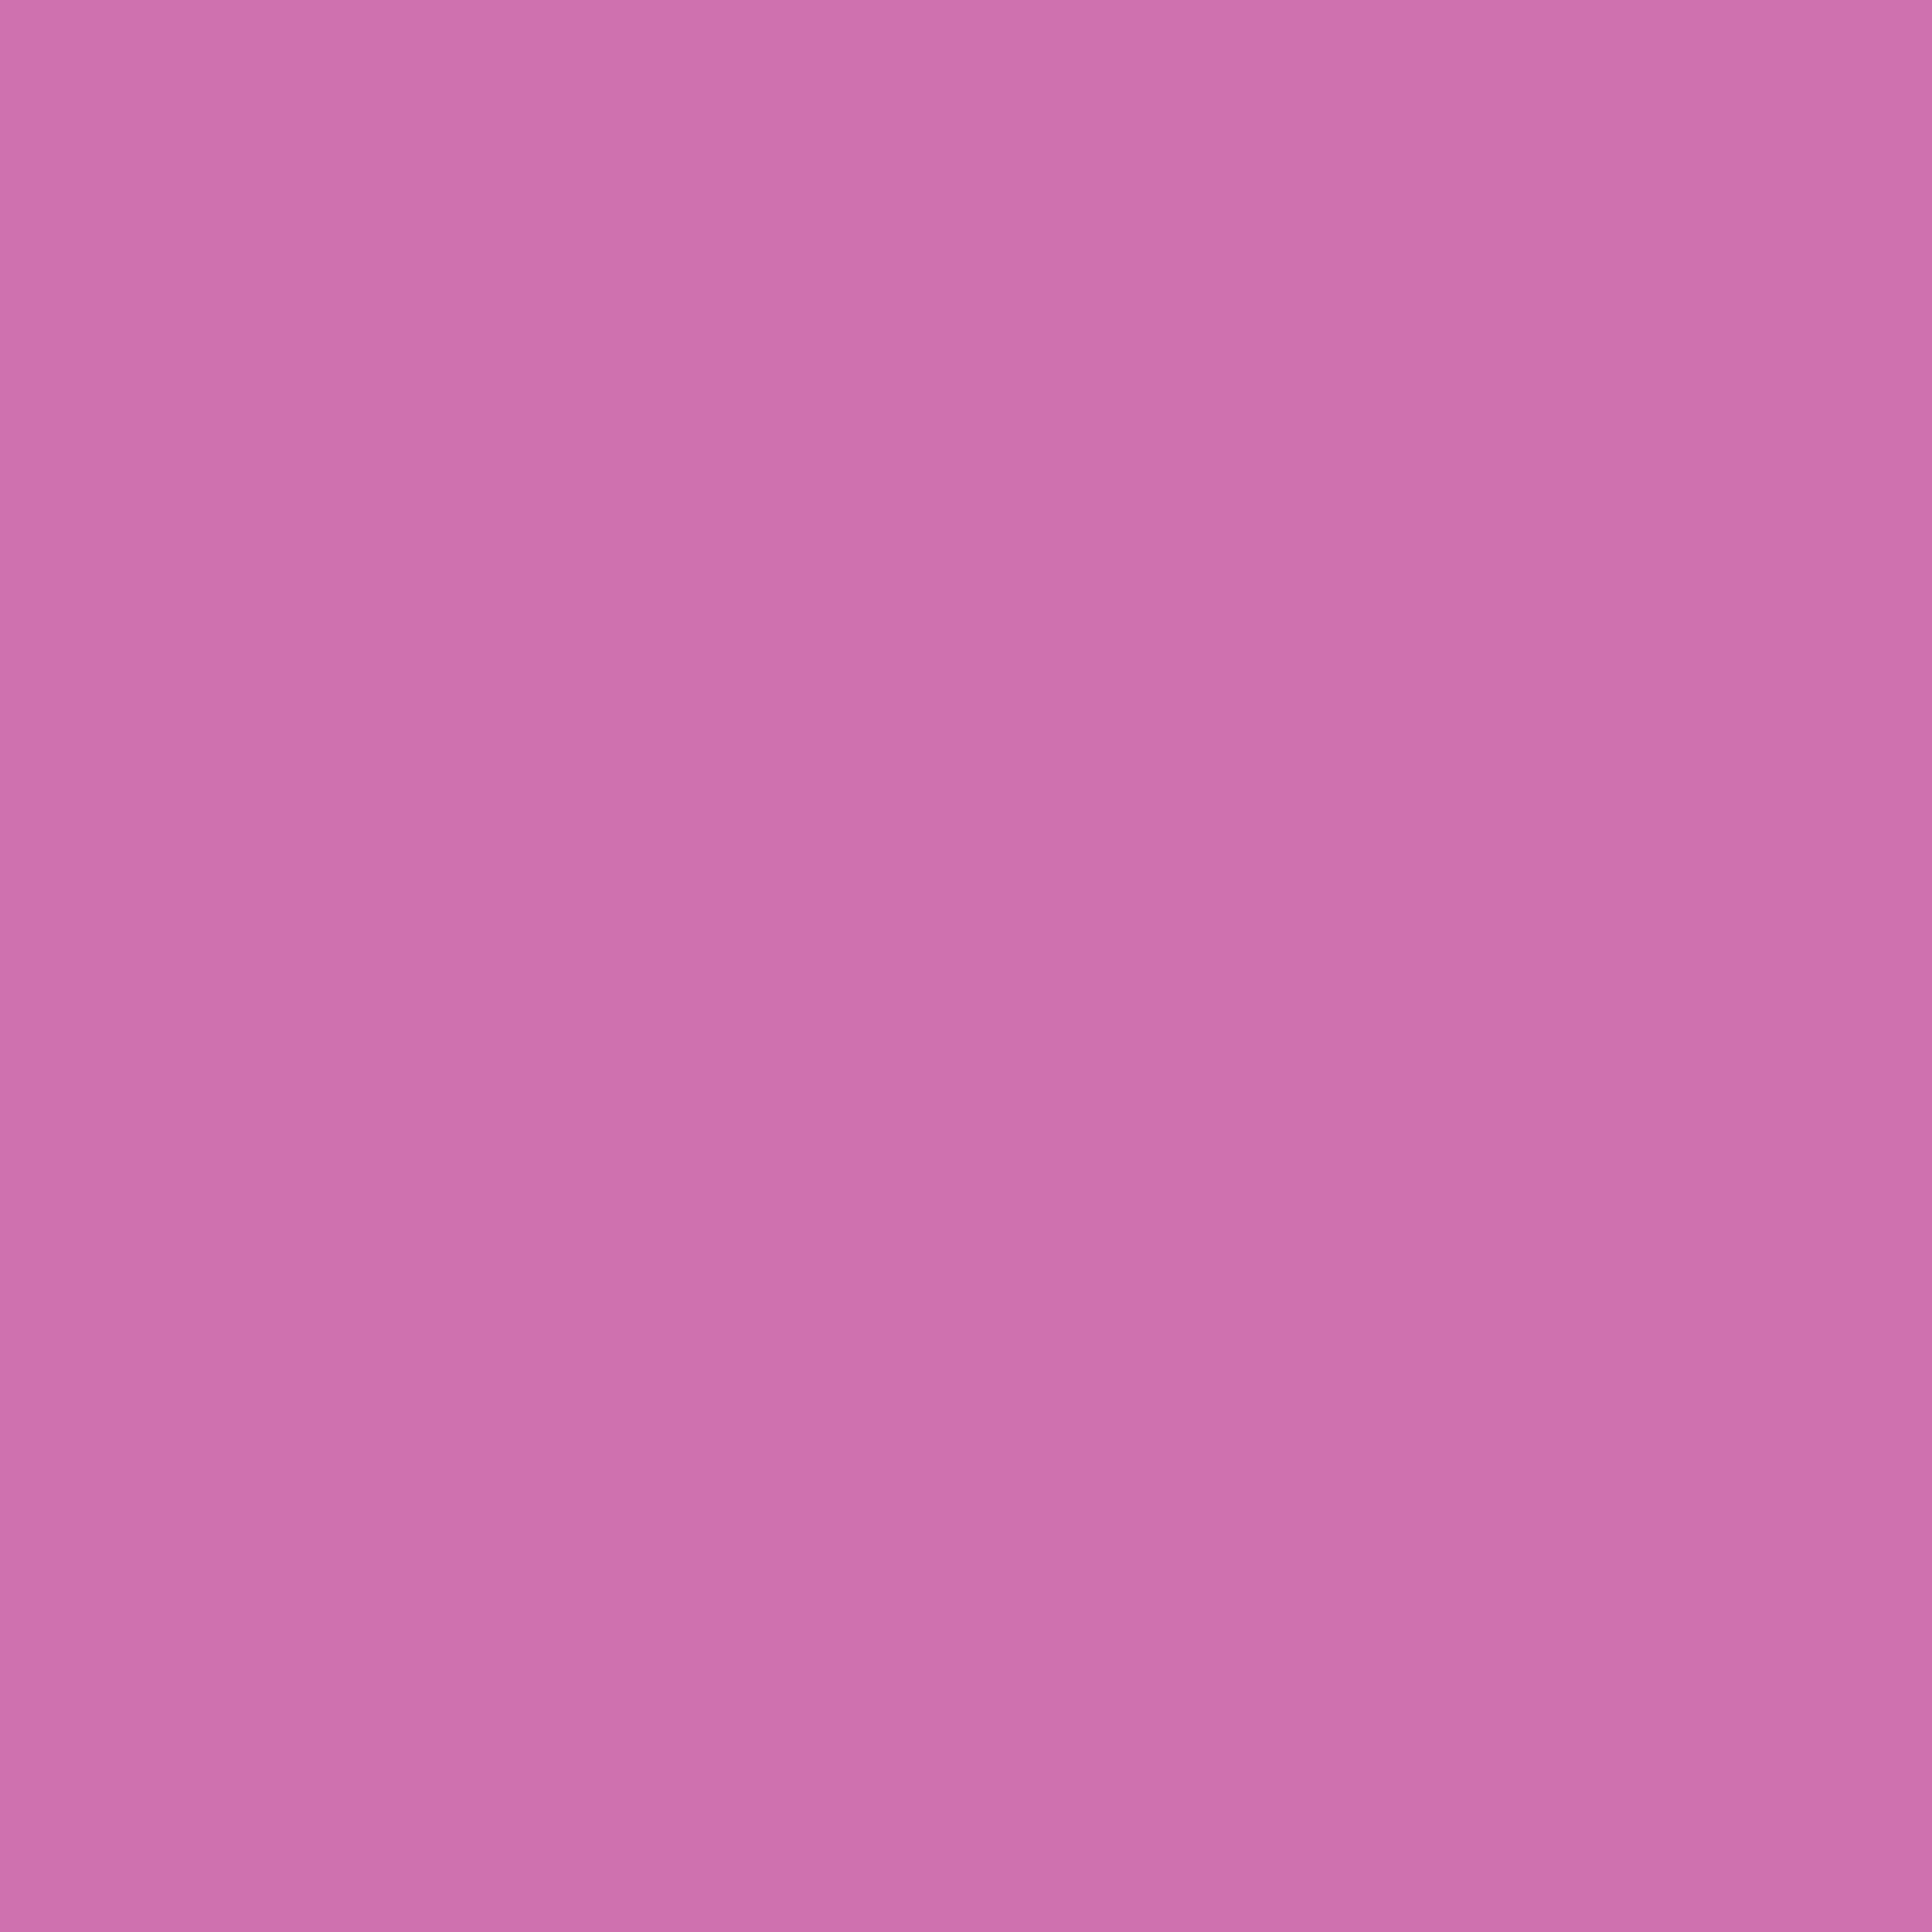 2732x2732 Sky Magenta Solid Color Background